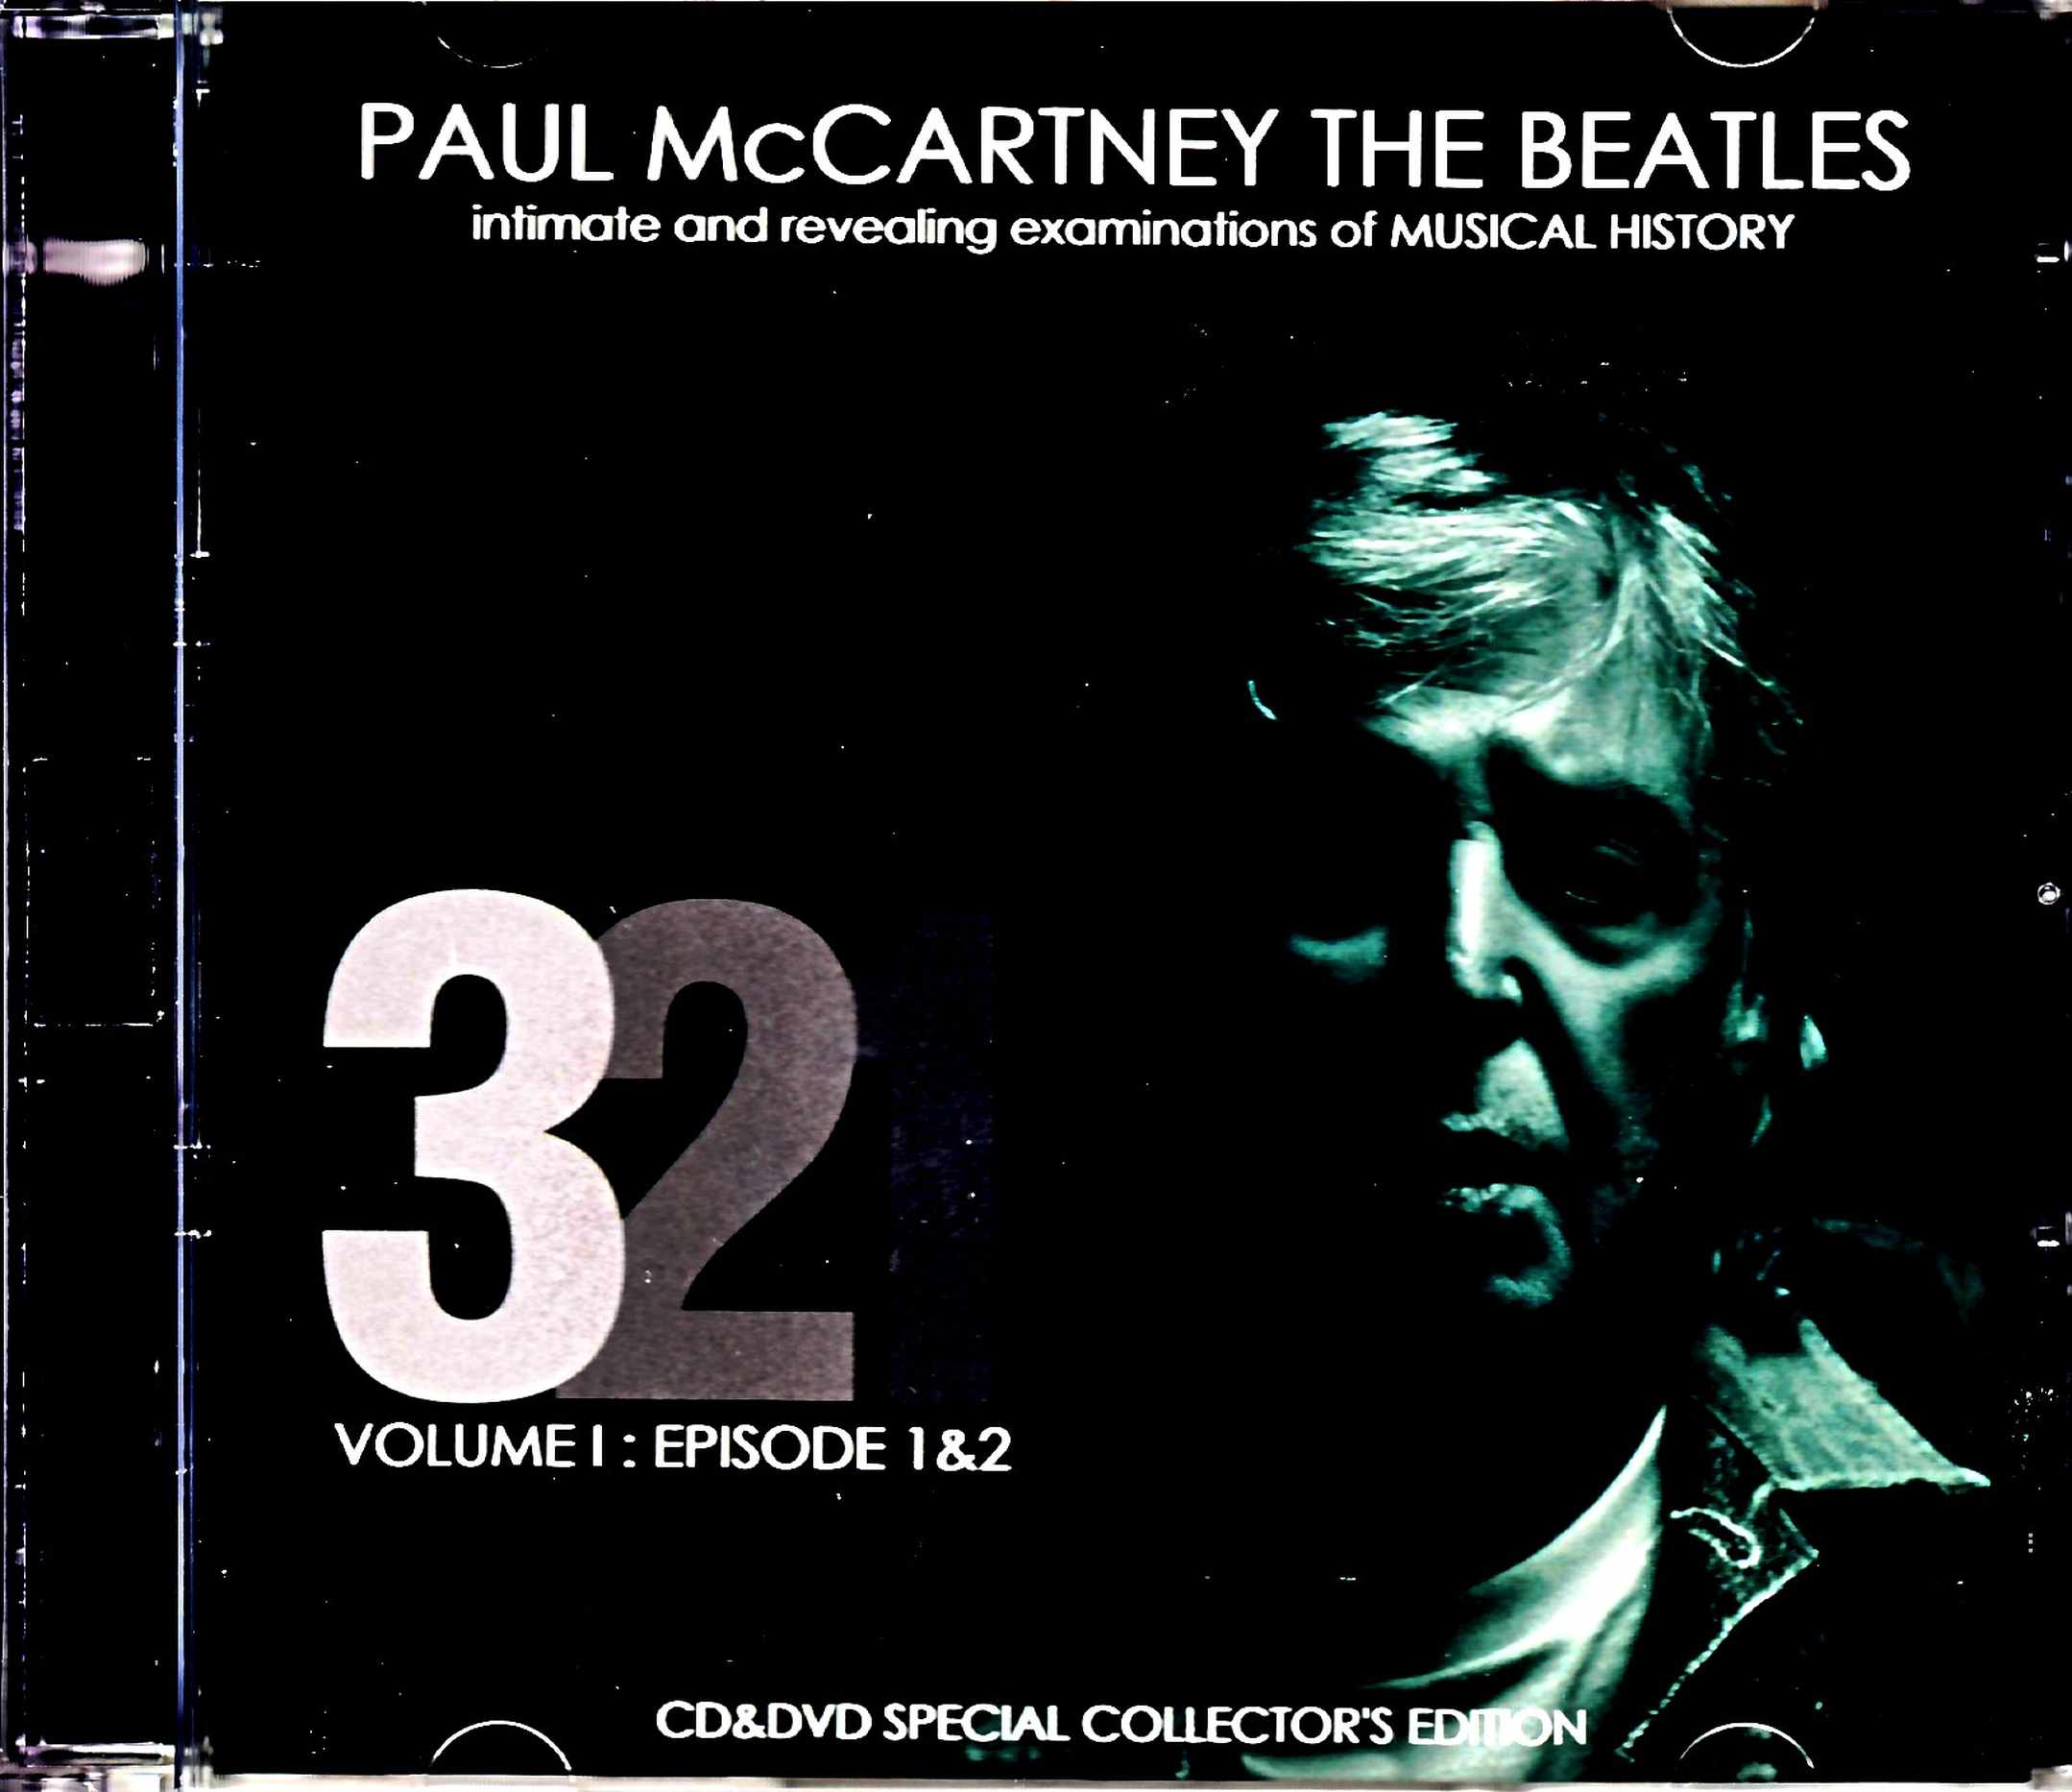 Paul McCartney Beatles ポール・マッカートニー ビートルズ/321 Intimate and Revealing of Music History Vol.1